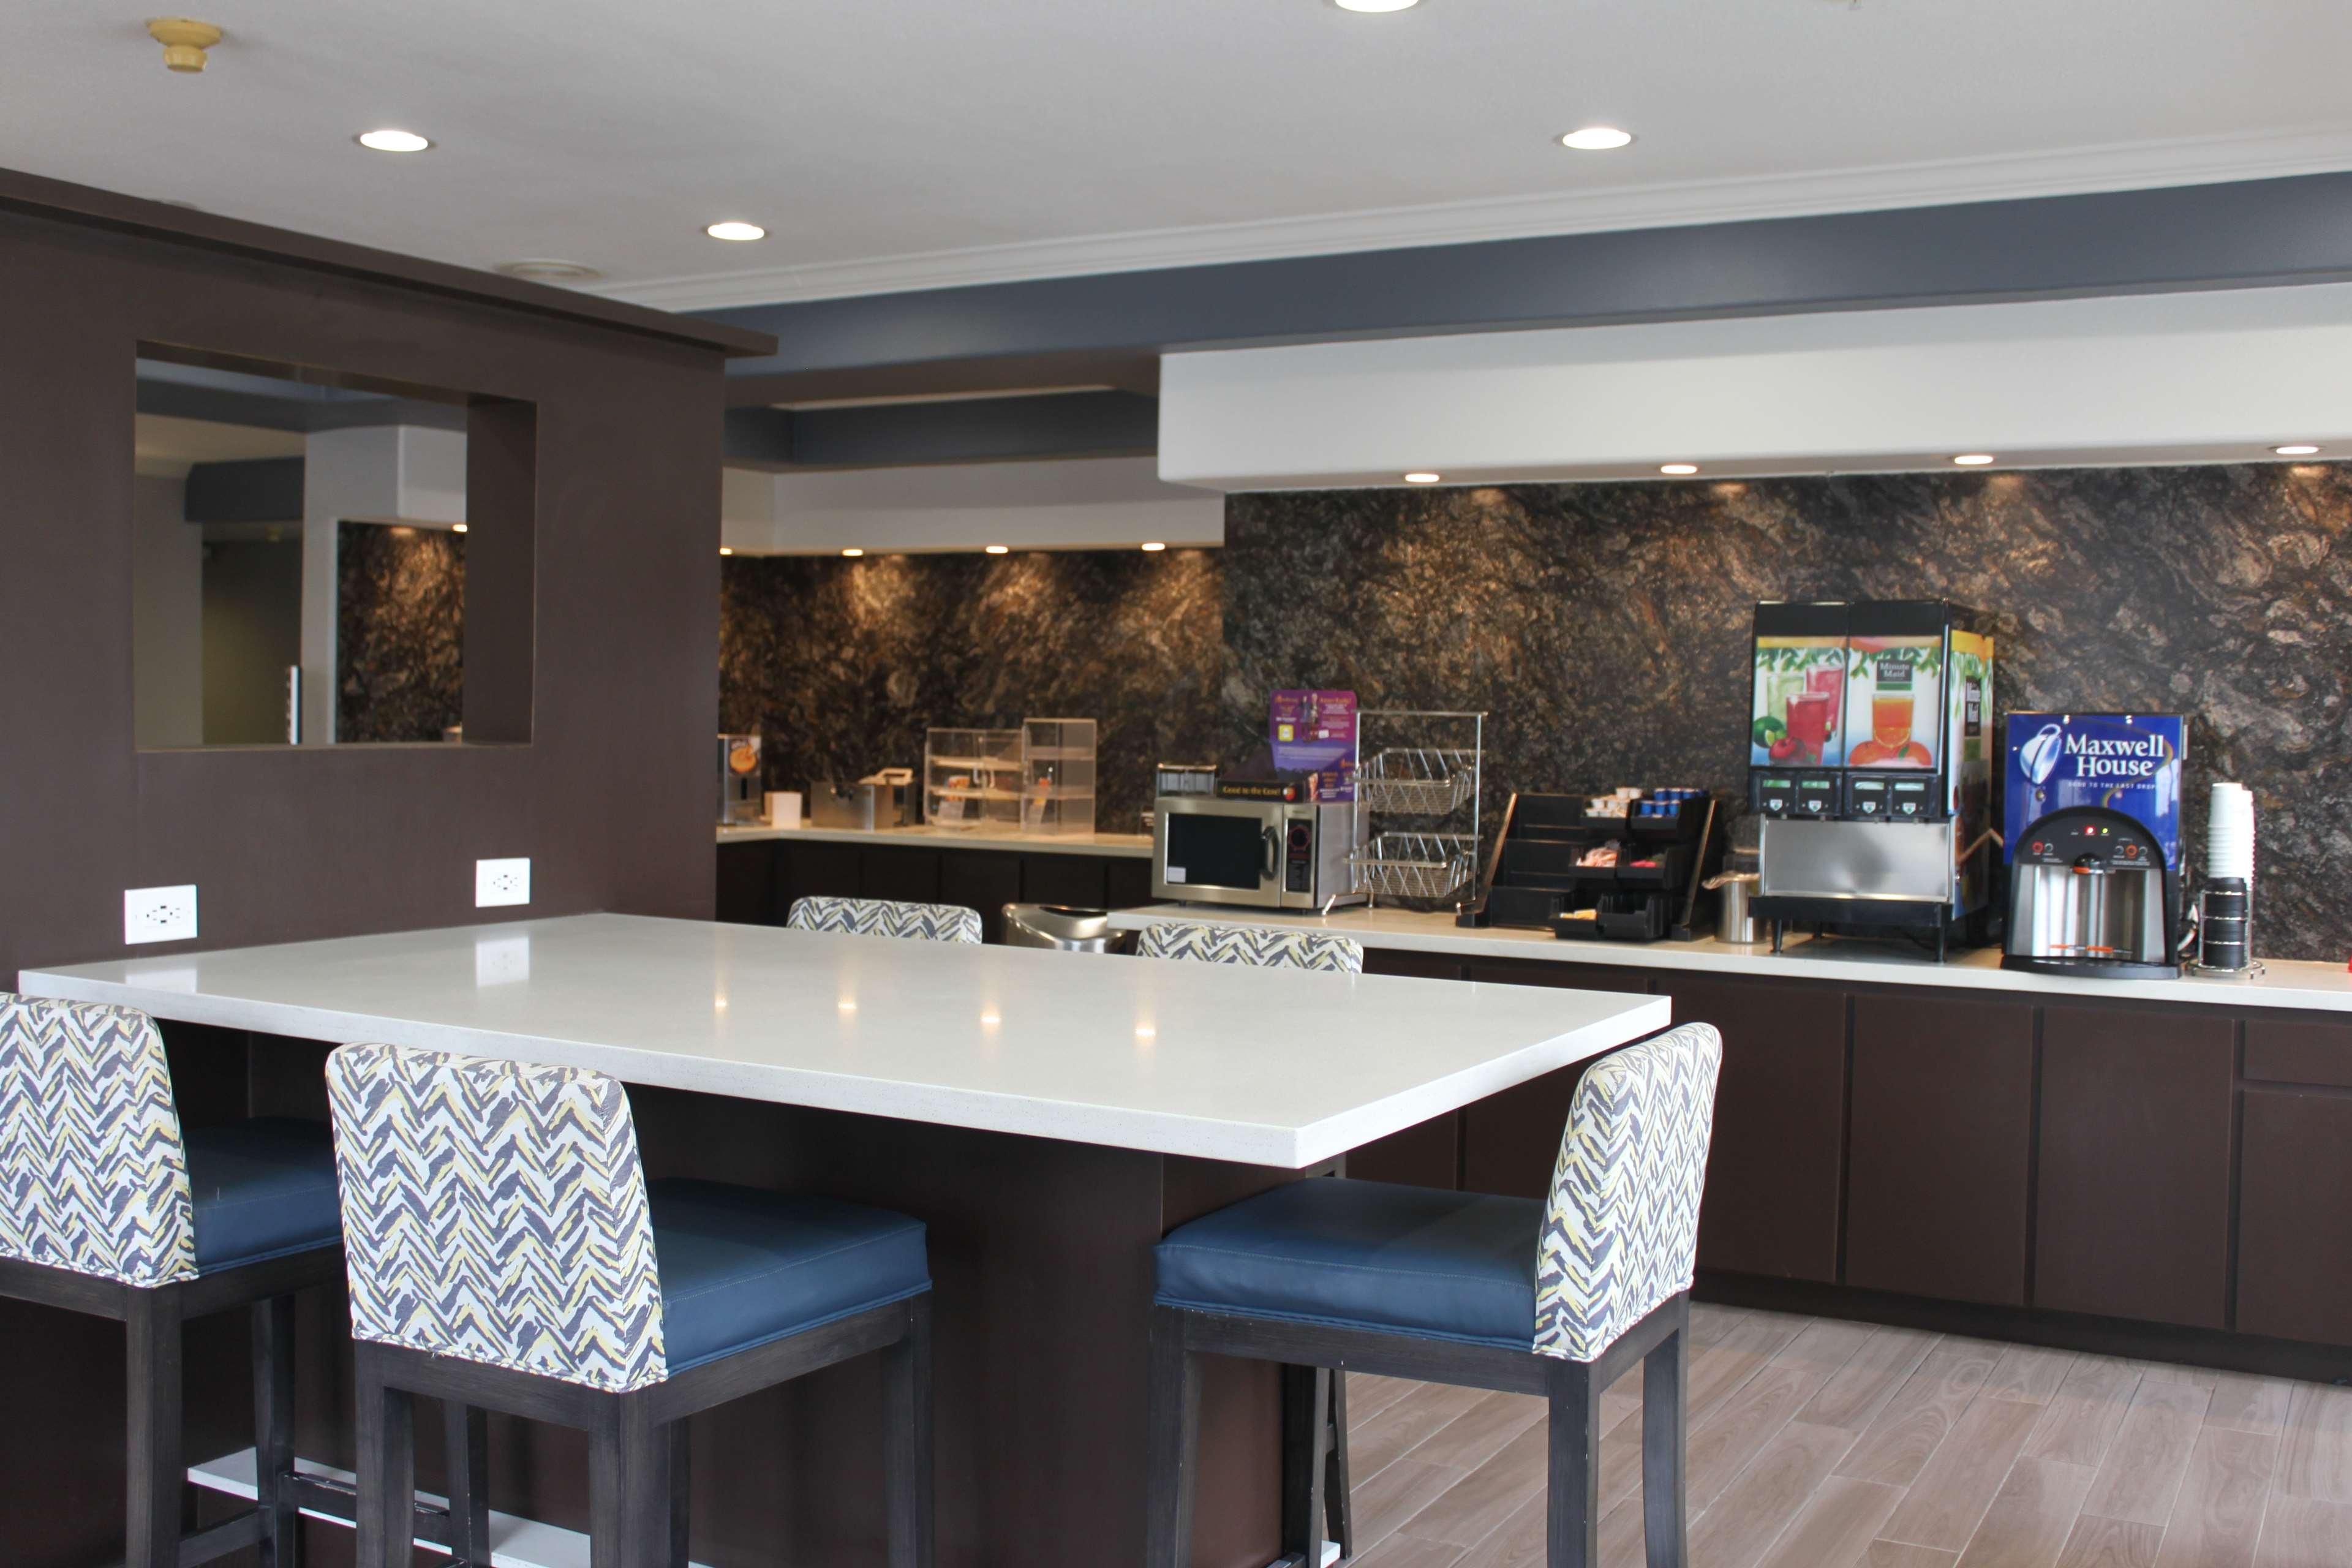 Best Western Plus North Houston Inn & Suites image 6